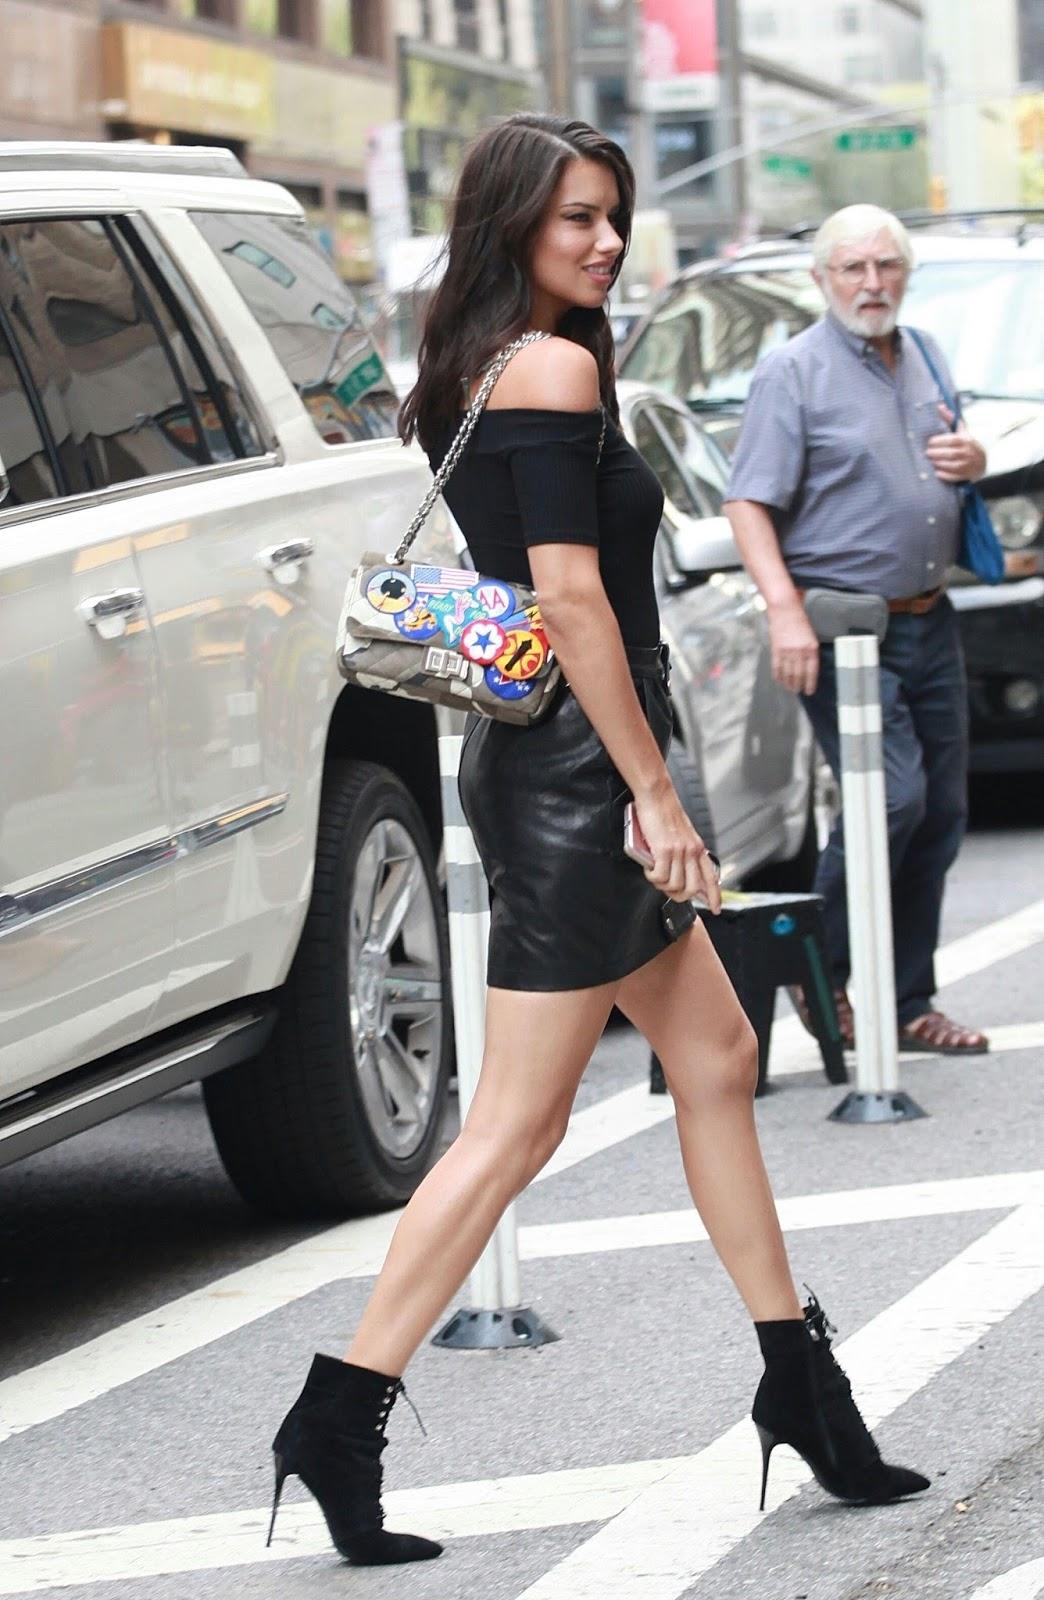 Adriana lima mini skirt, monica sweetheart en sus ratos pajilleros